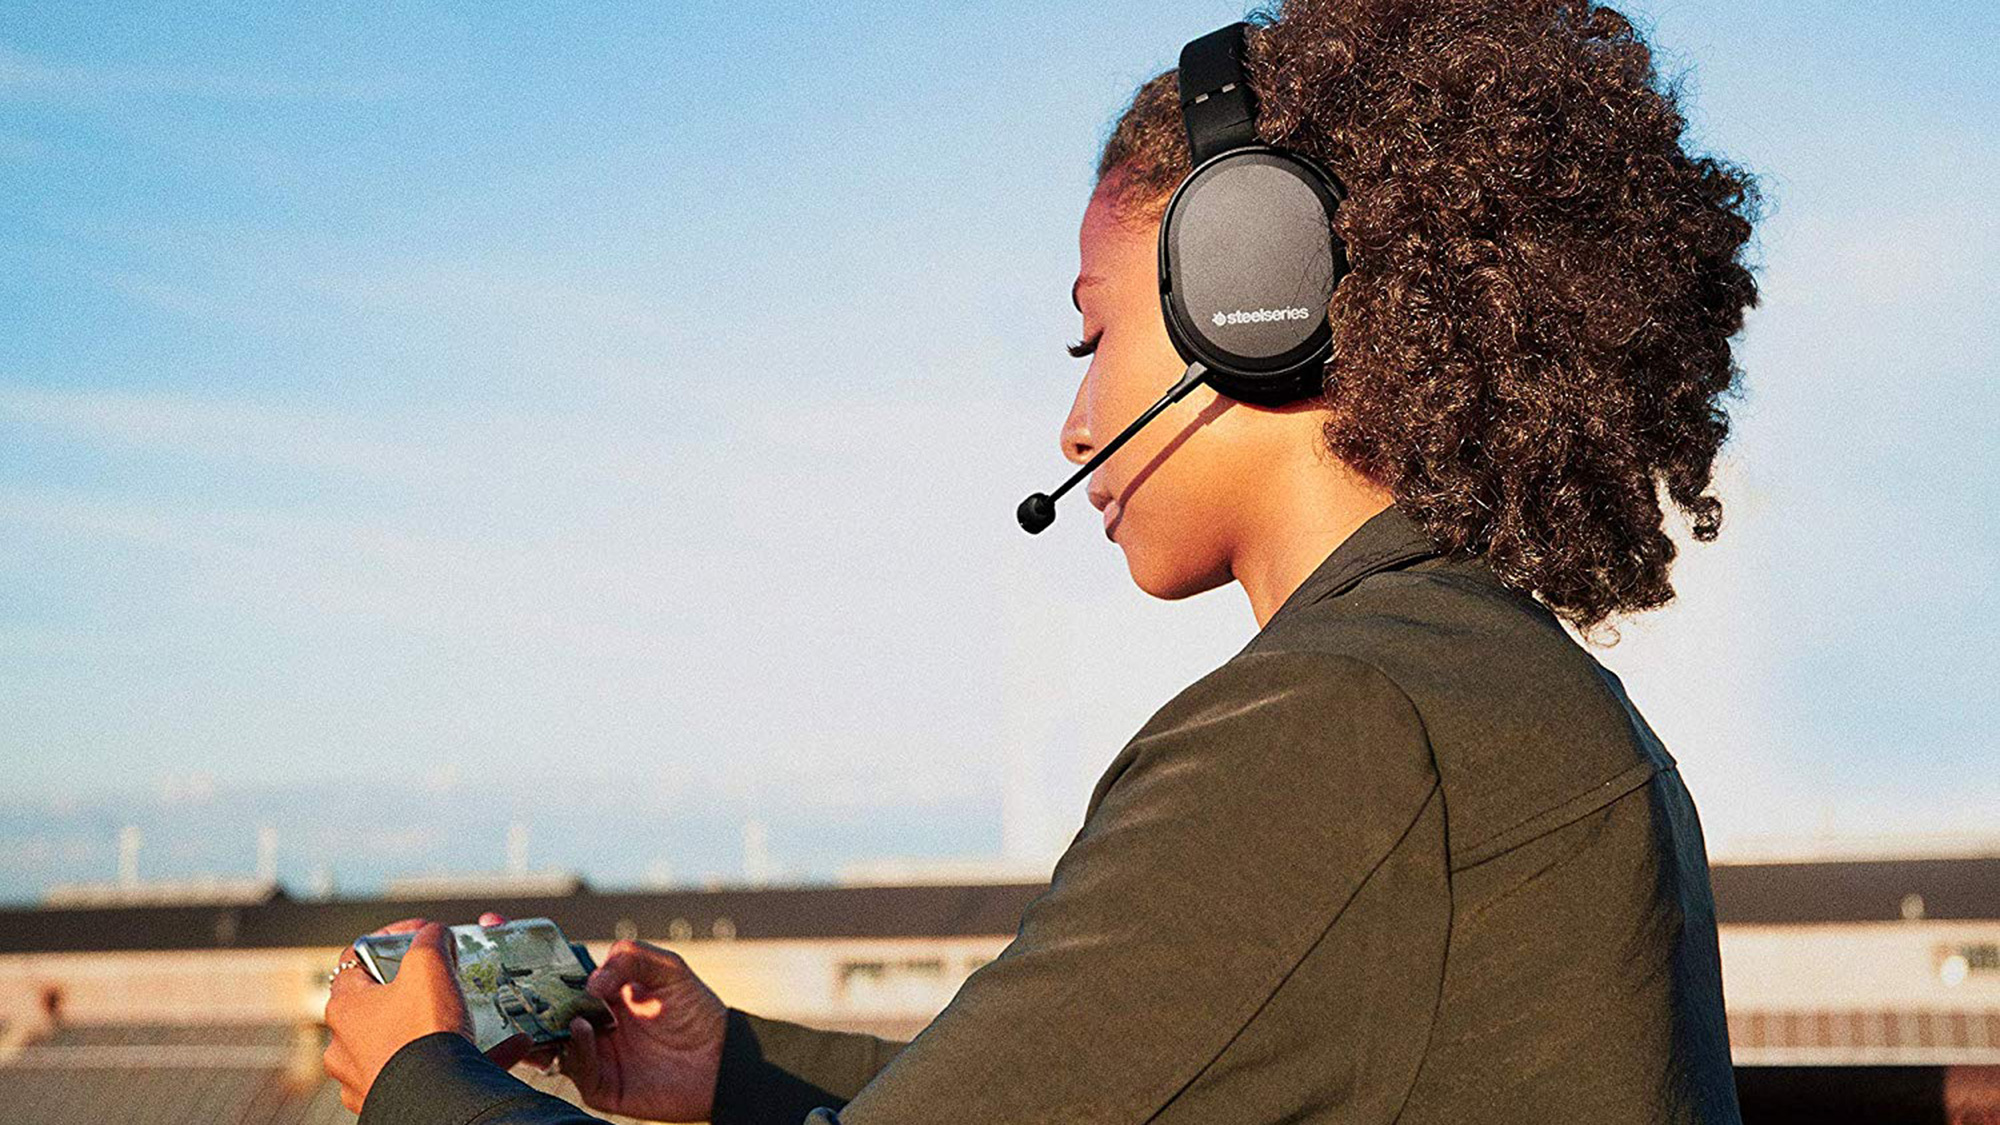 Best wireless gaming headsets: SteelSeries Arctis 1 Wireless